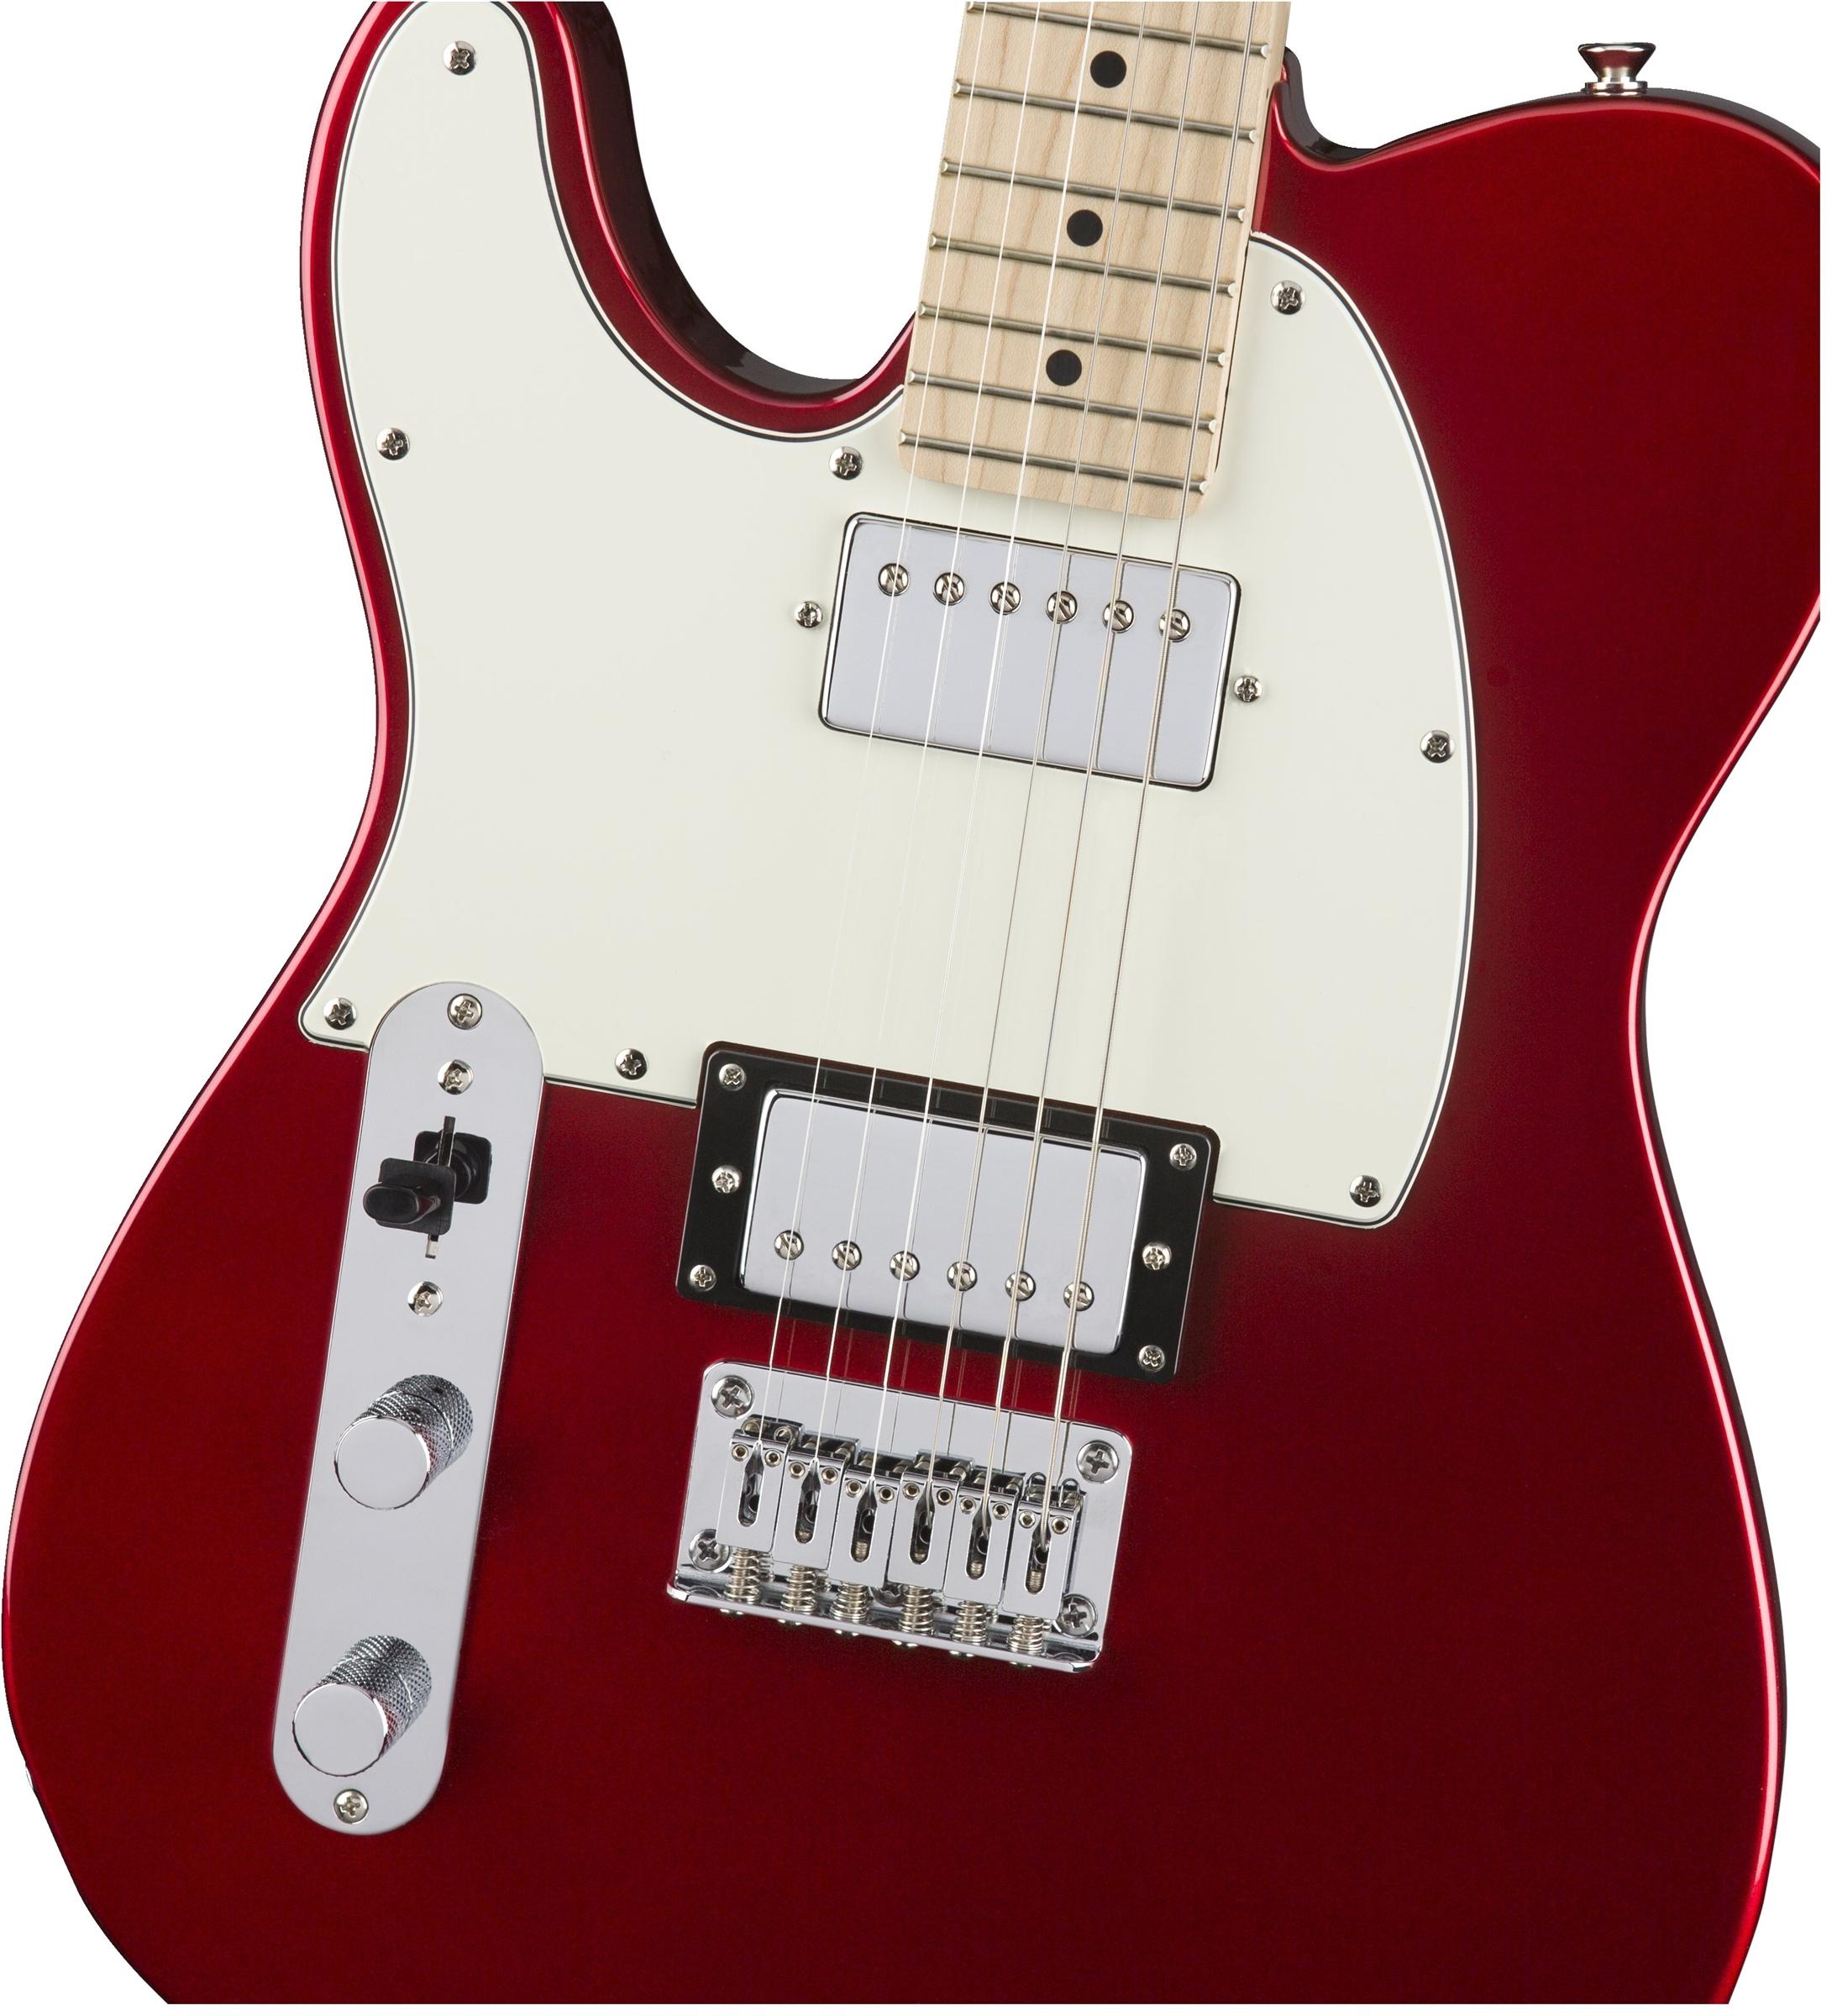 Fender Jaguar Sweetwater: Squier Contemporary Telecaster® HH Left-Handed